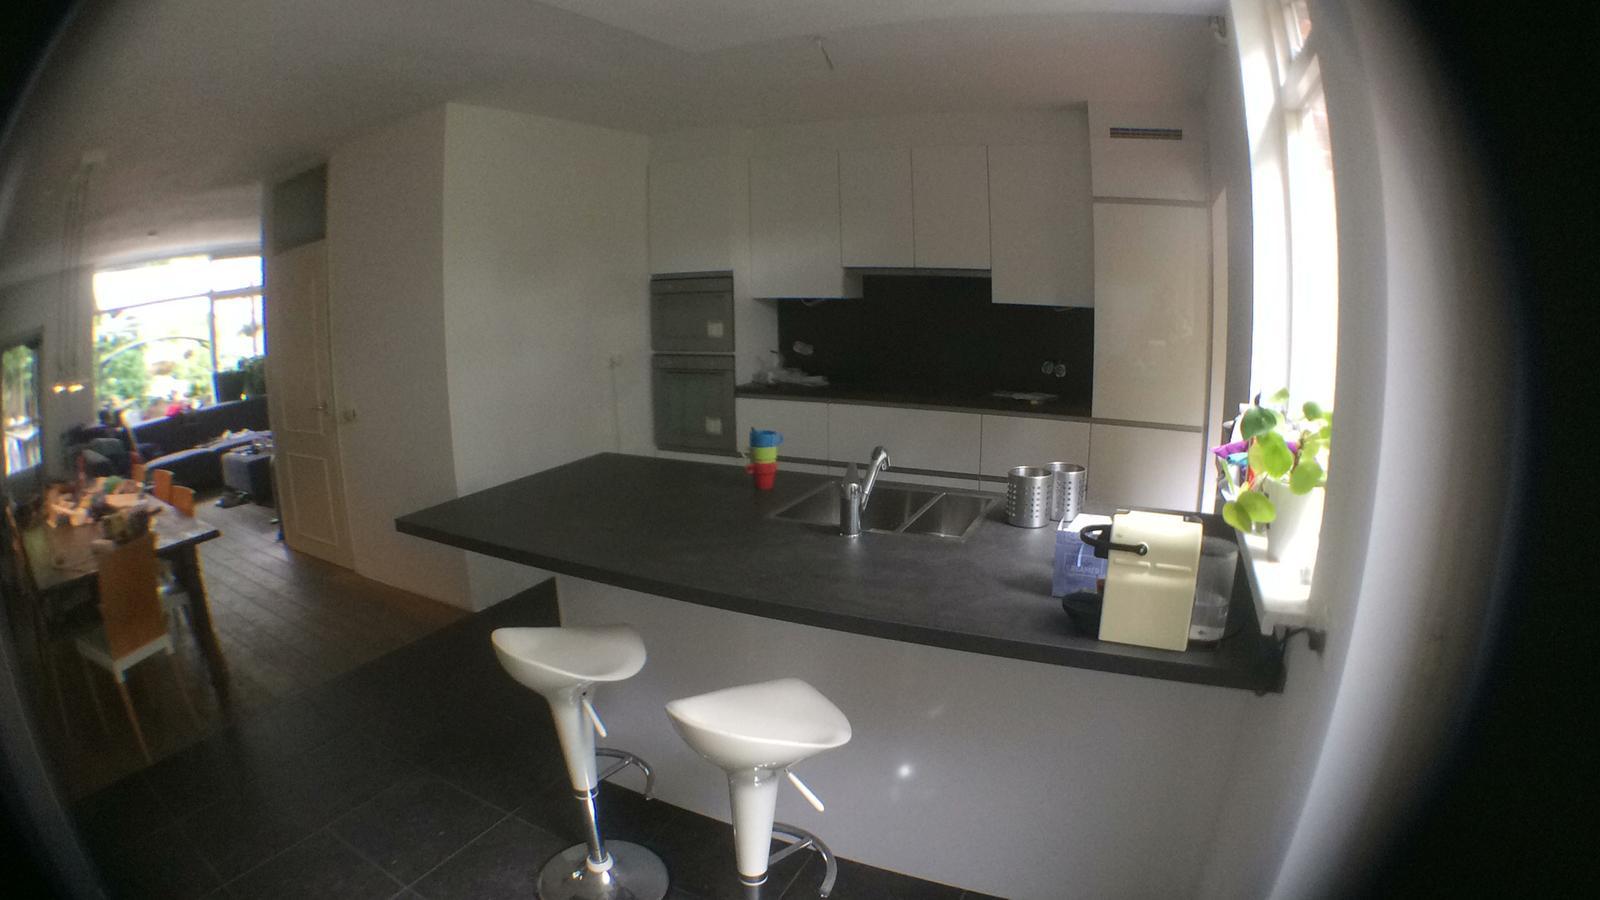 keuken gekocht bij I-Kook Sittard, Keukenmatch, keukenontwerp, positieve klantervaring, keukenopstelling, hoogglans wit, alpine, lak